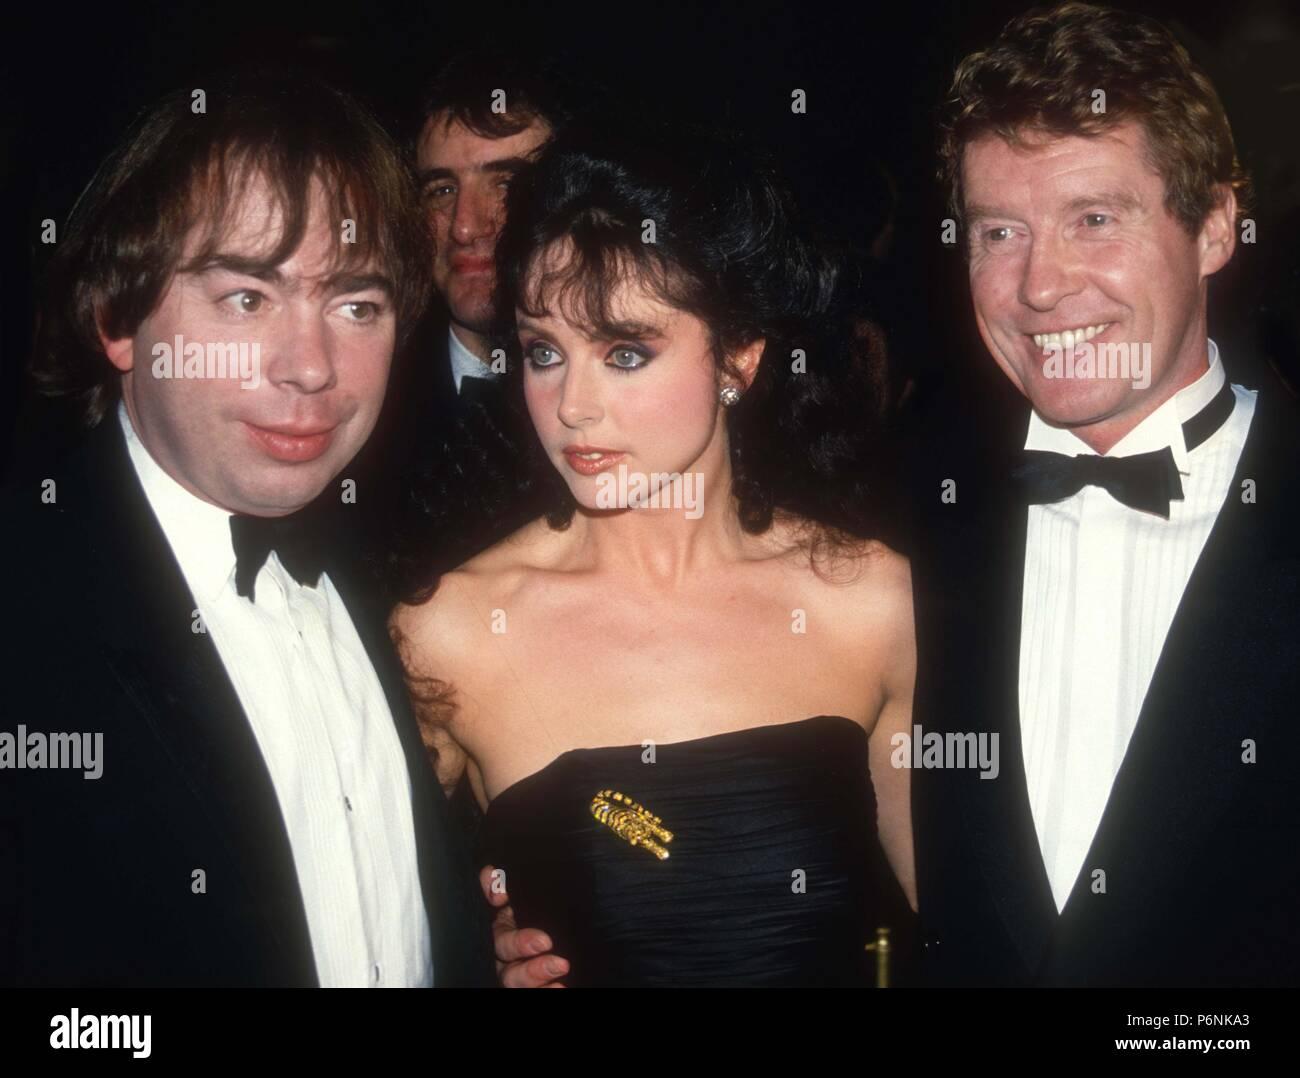 andrew lloyd webber sarah brightman michael crawford 1986